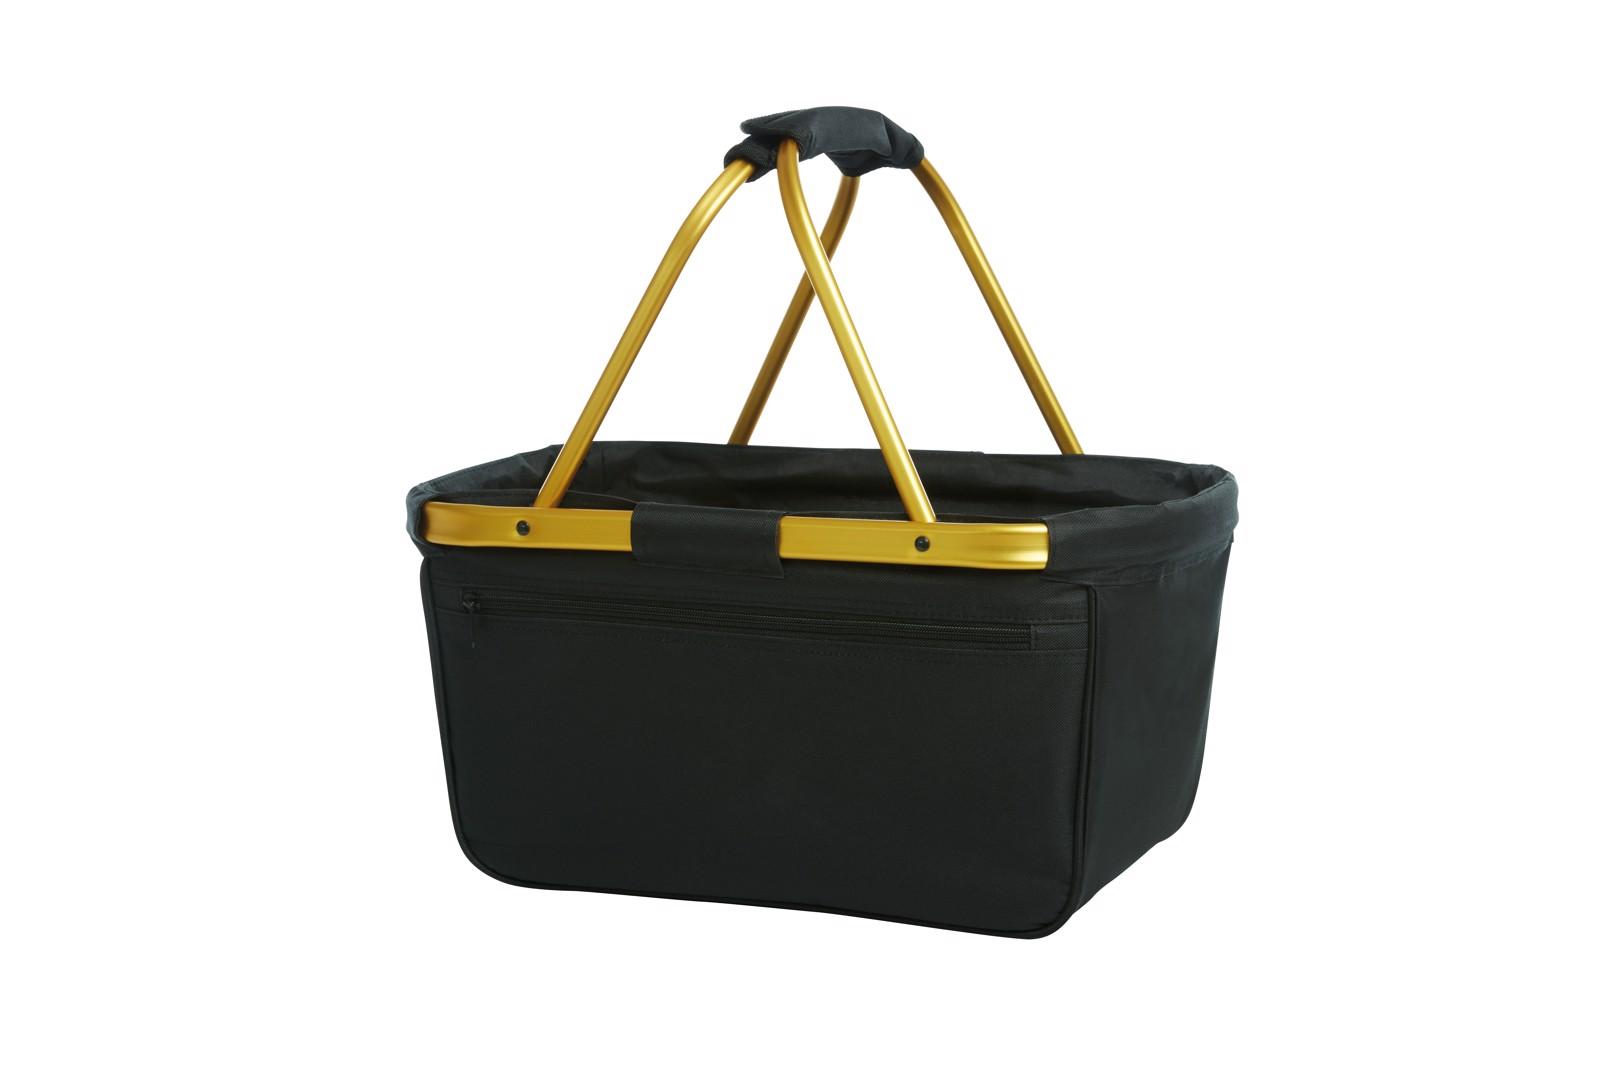 Shopper Black Basket - Zlato